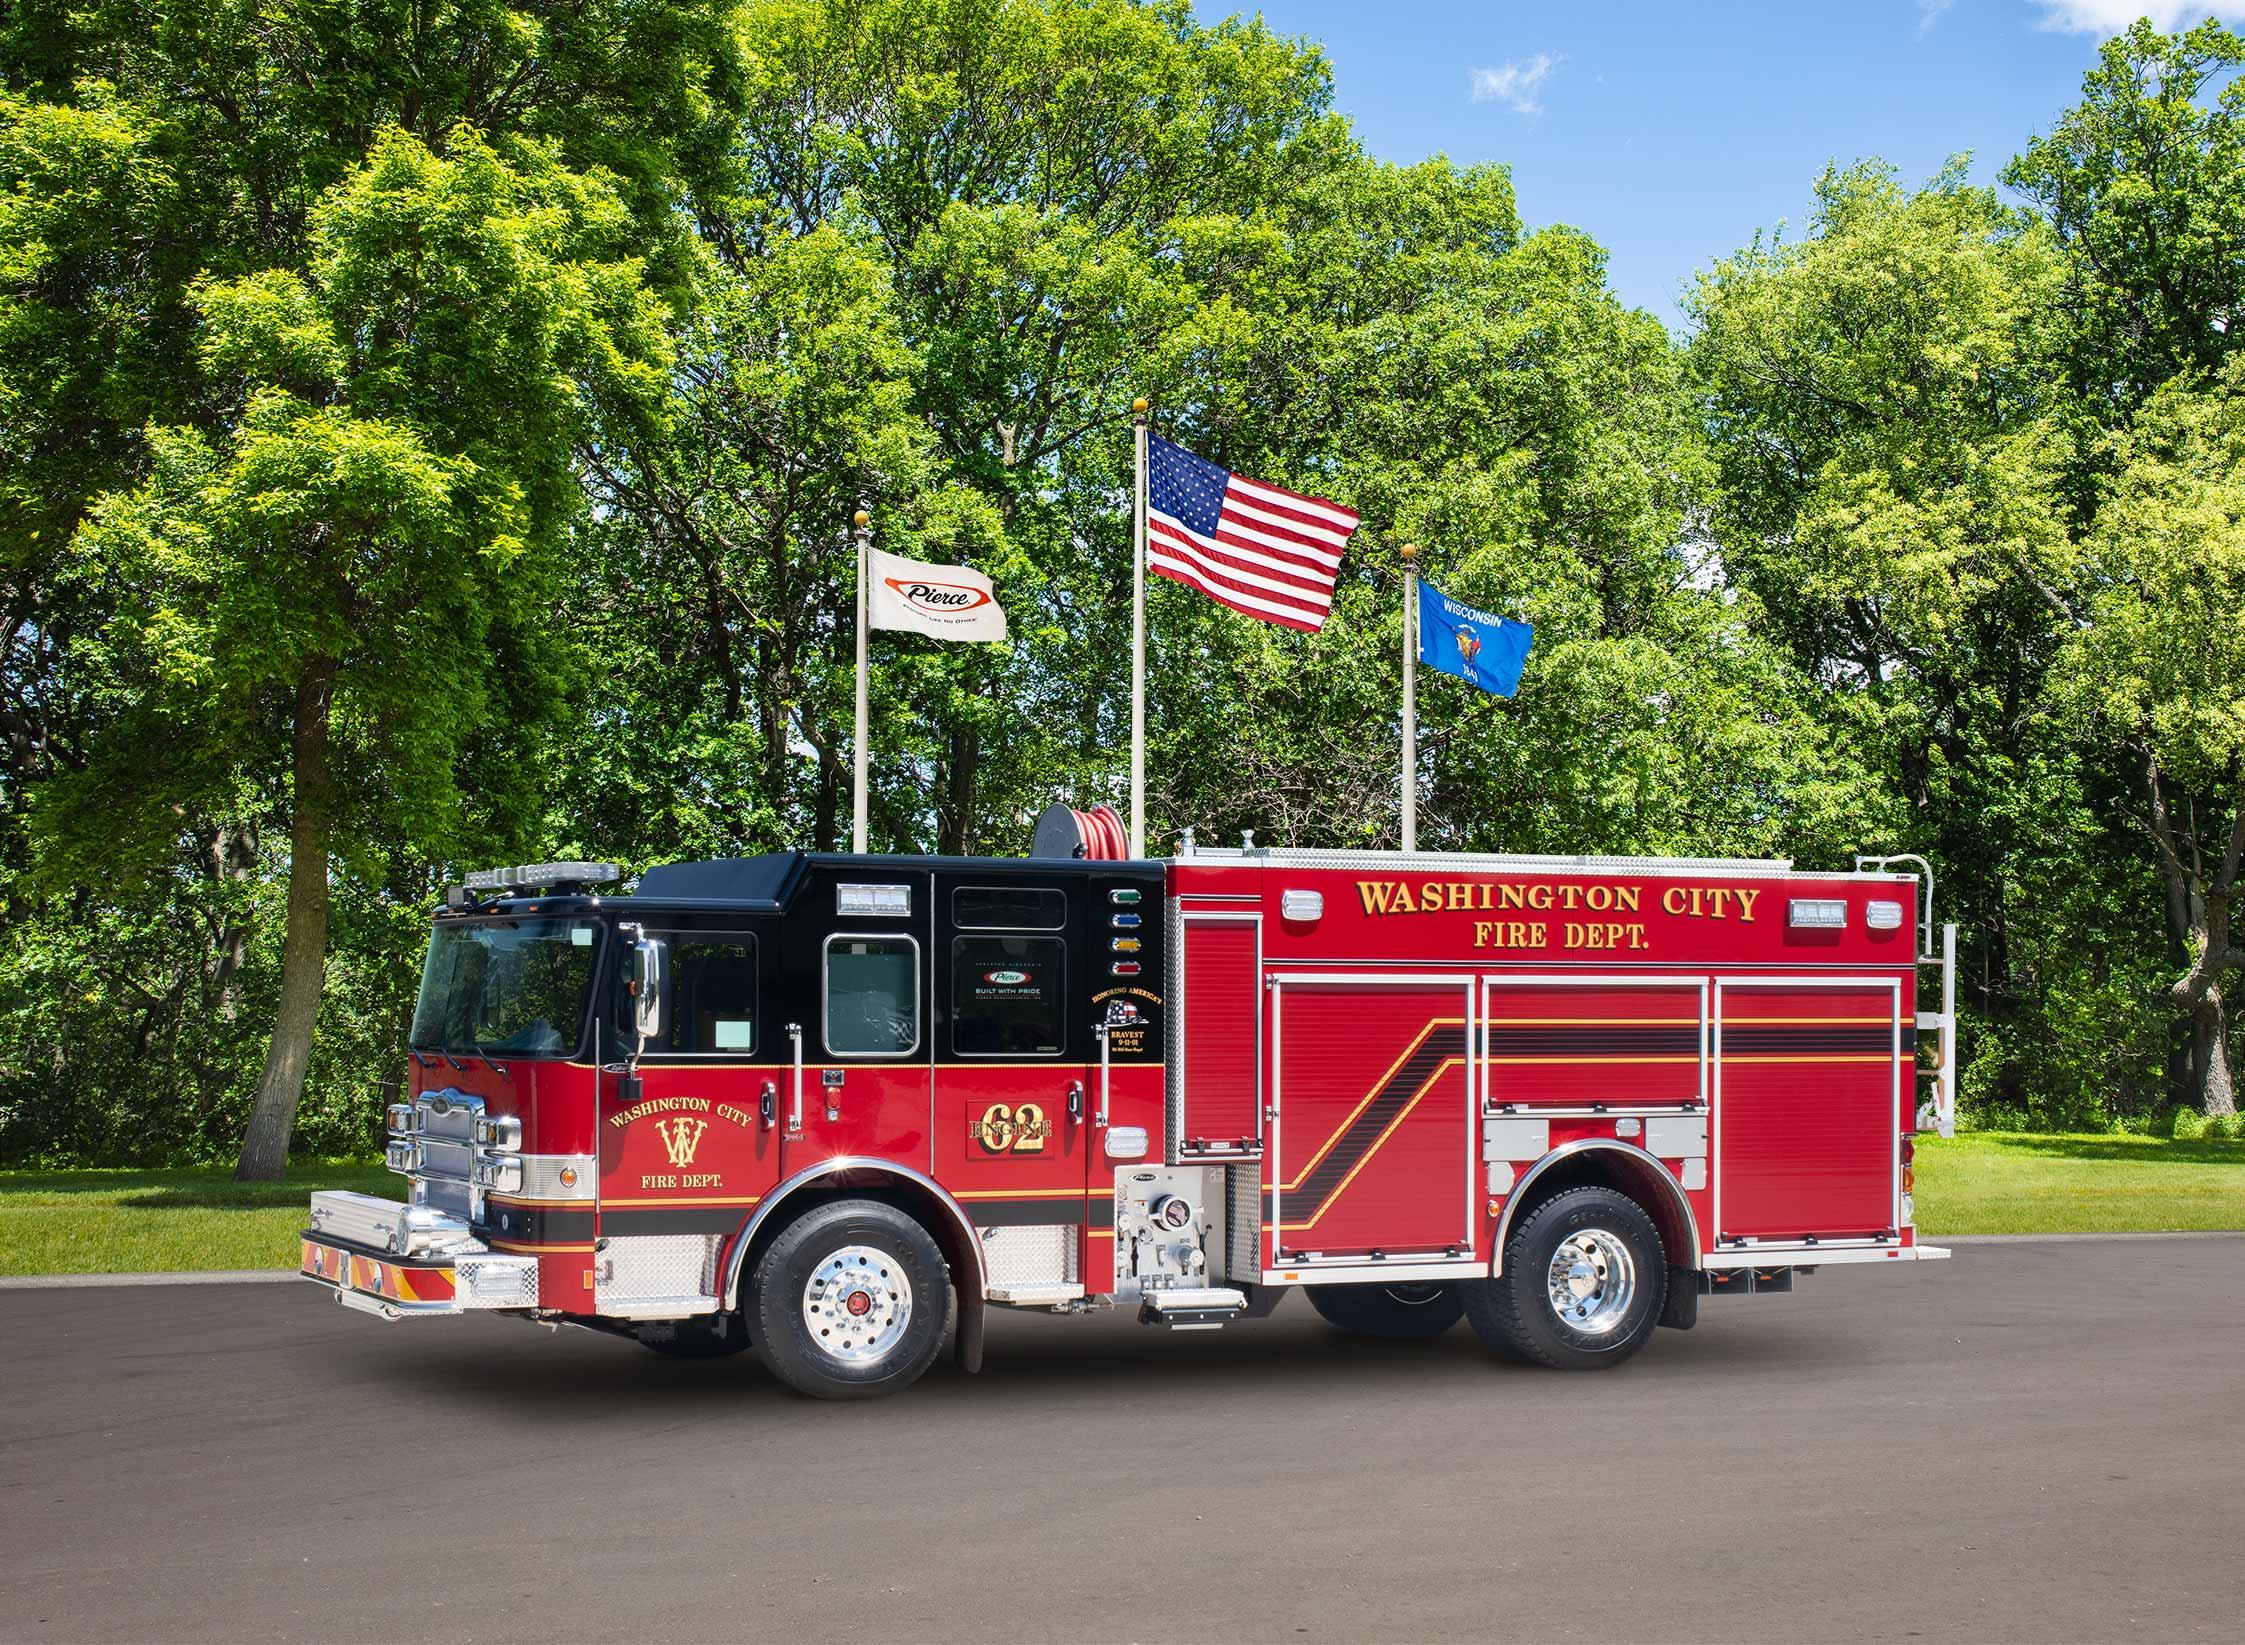 Washington City Fire Department - Pumper